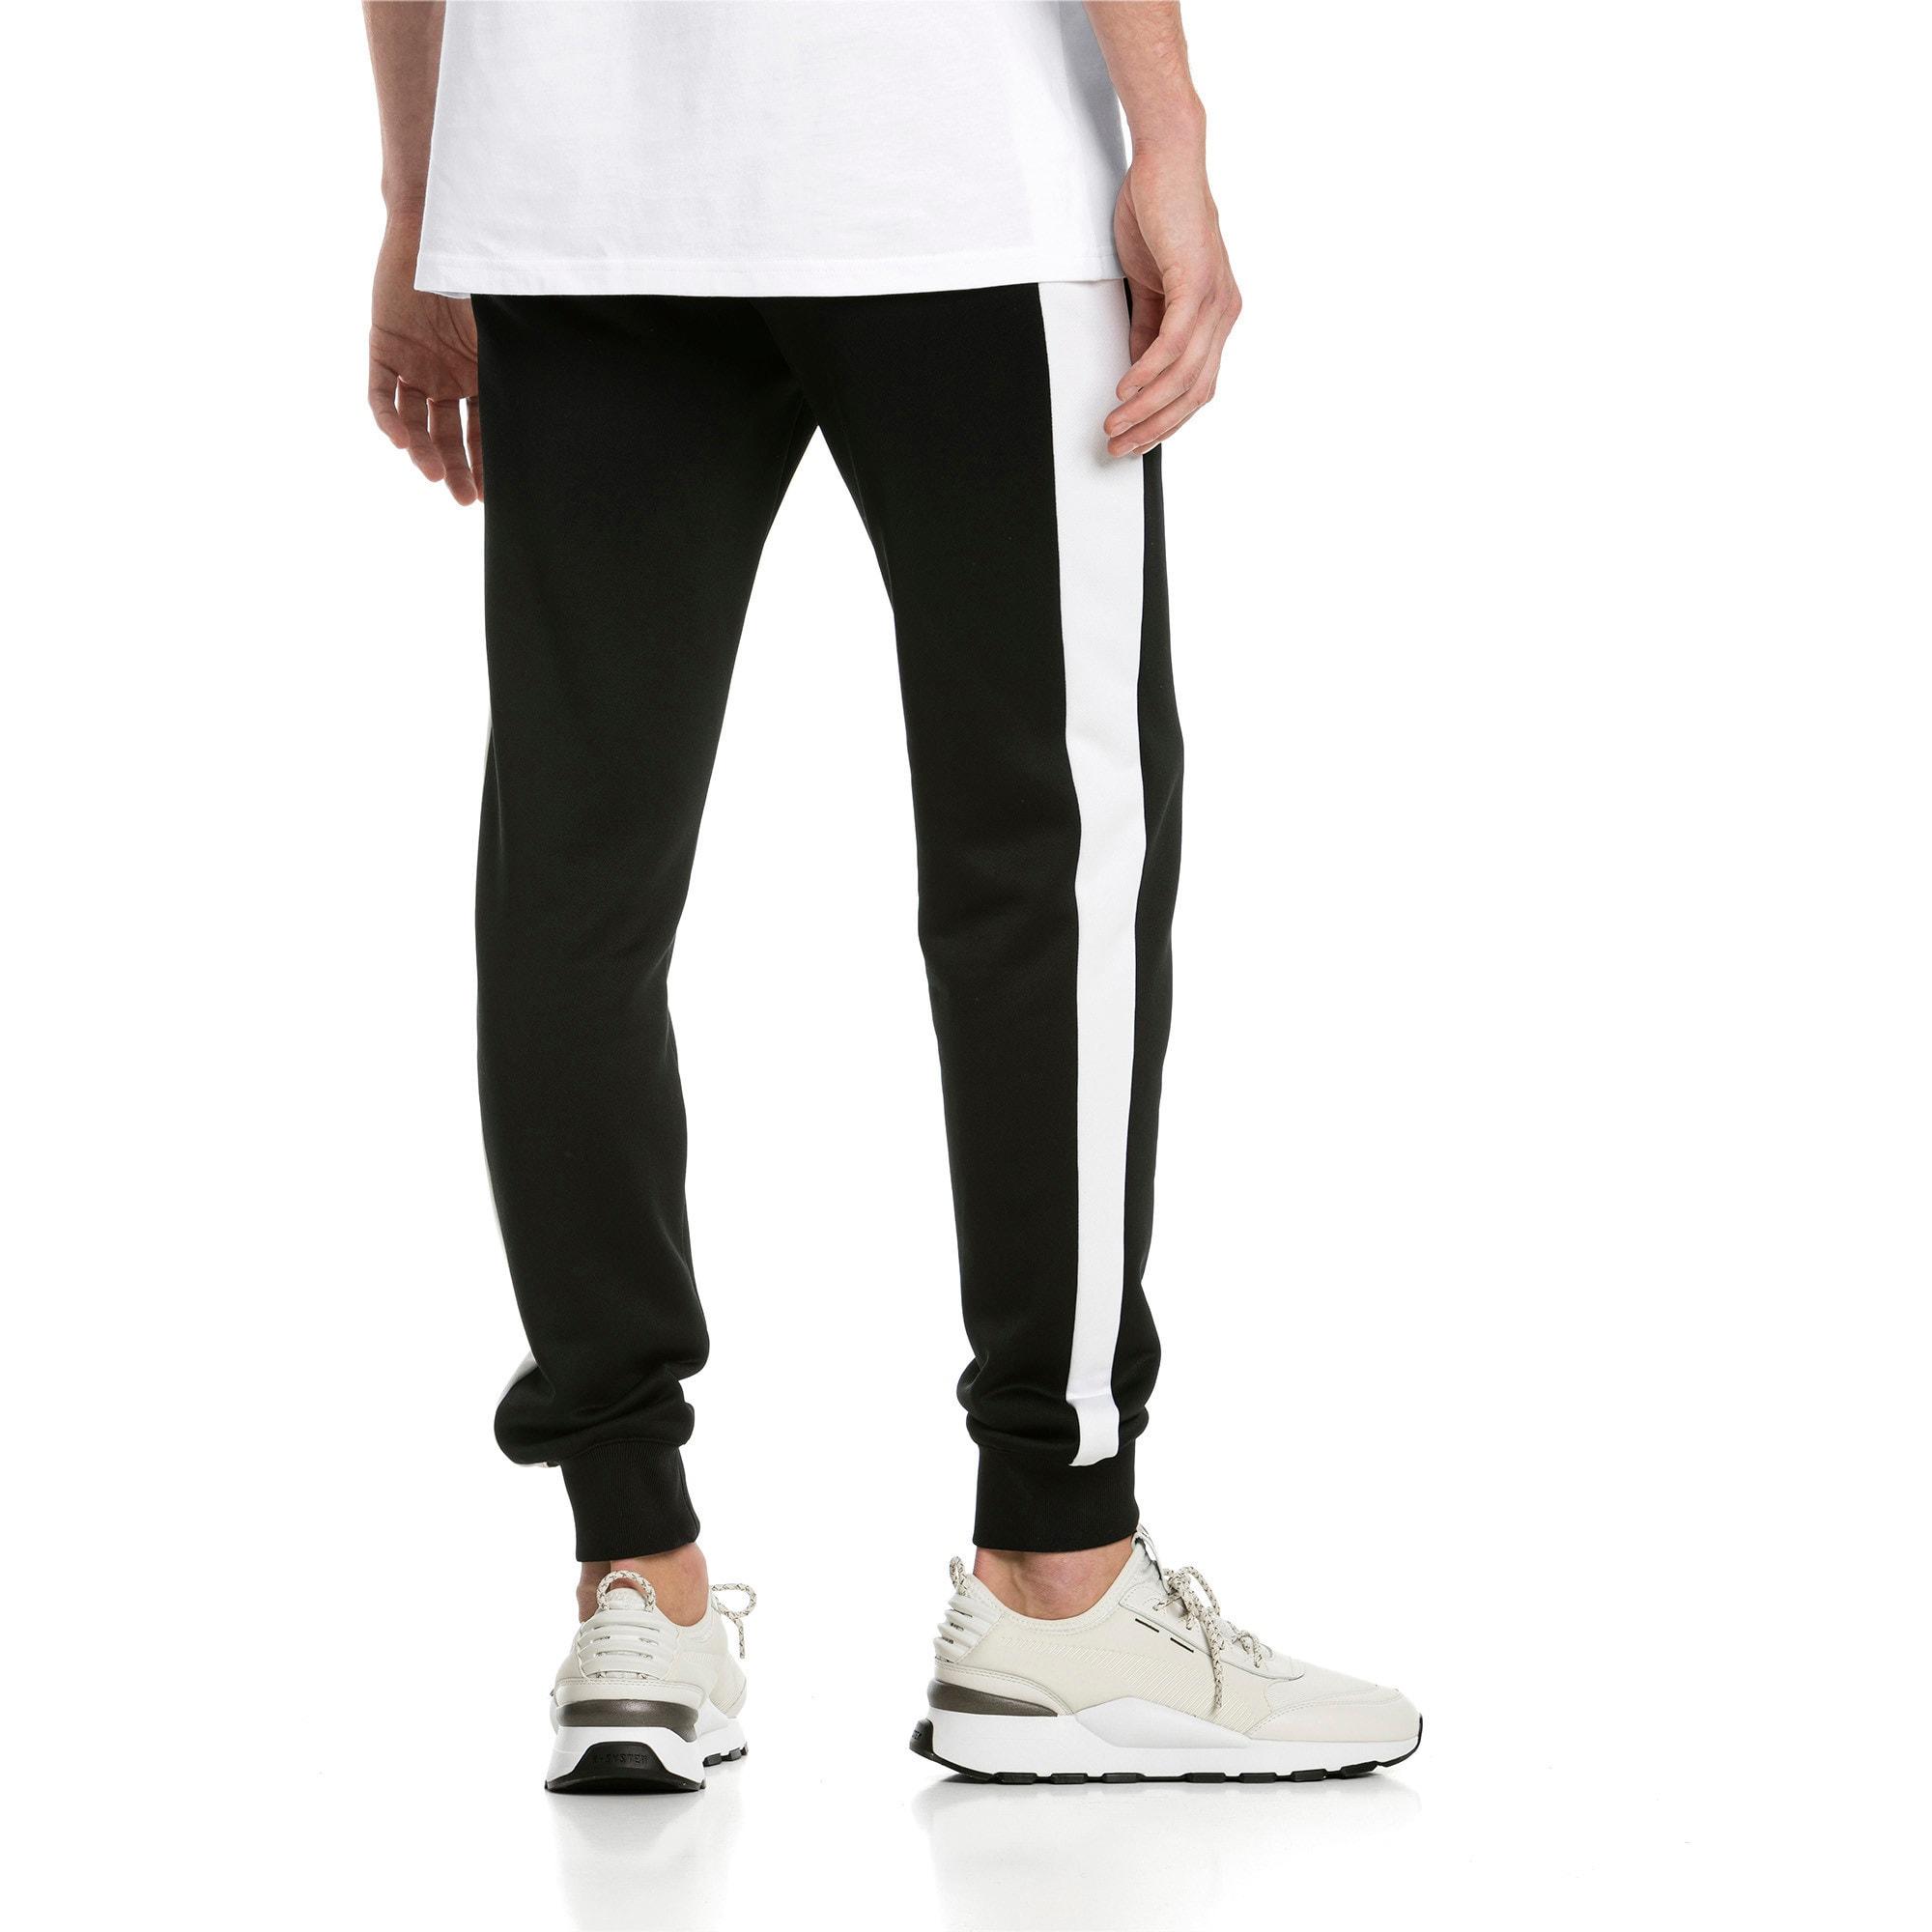 Thumbnail 2 of Iconic T7 Herren Gestrickte Sweatpants, Puma Black, medium